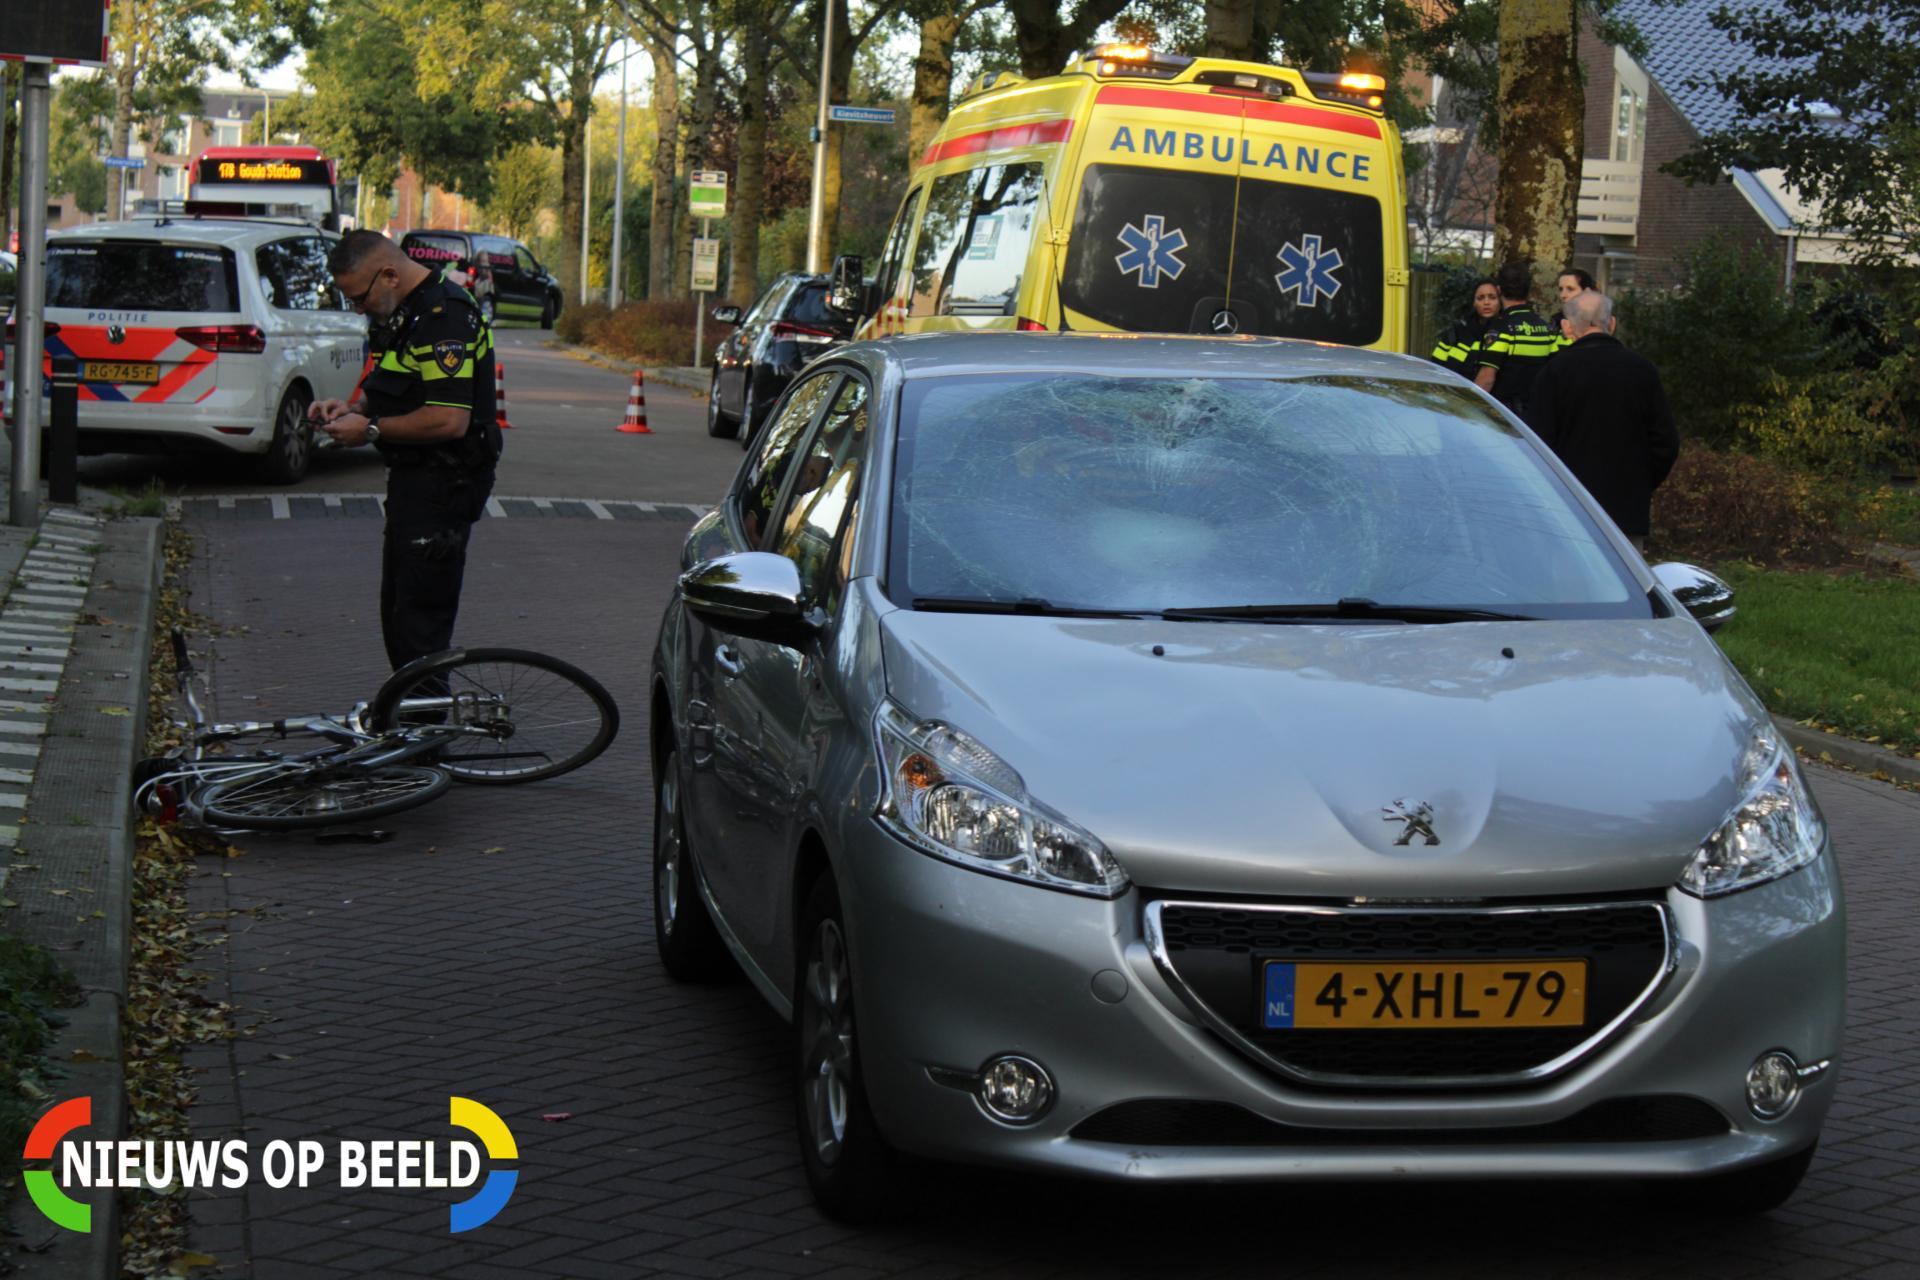 Fietser gewond na aanrijding met auto Grutto Bodegraven